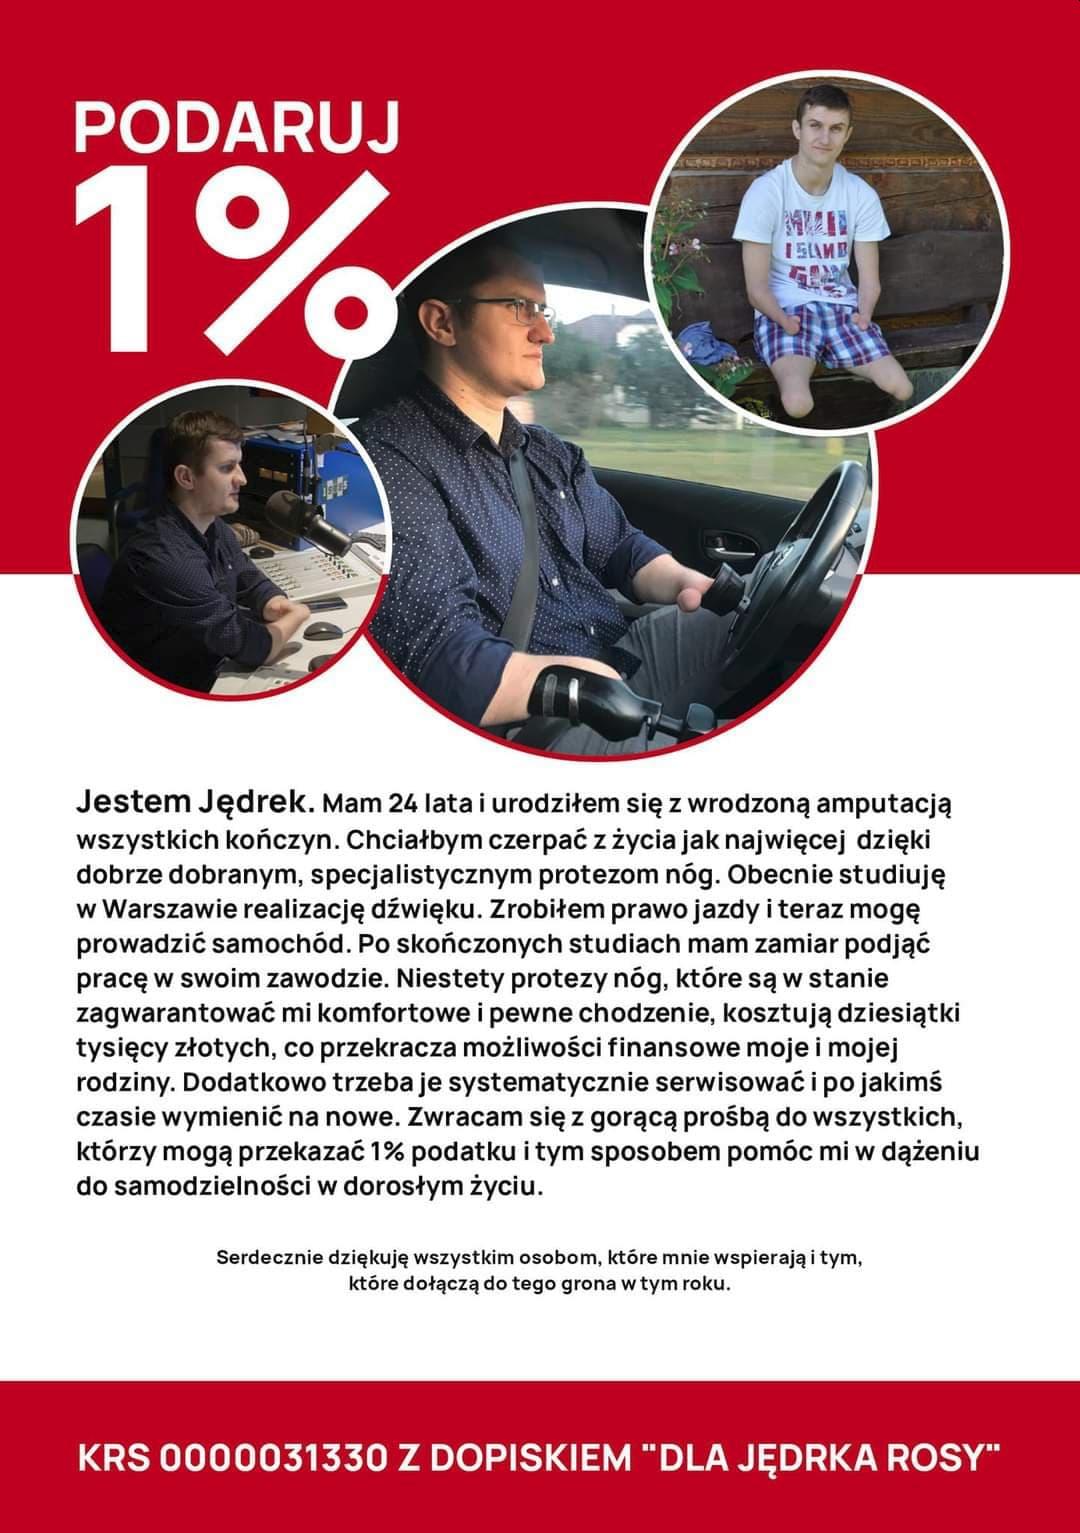 jedrek.png